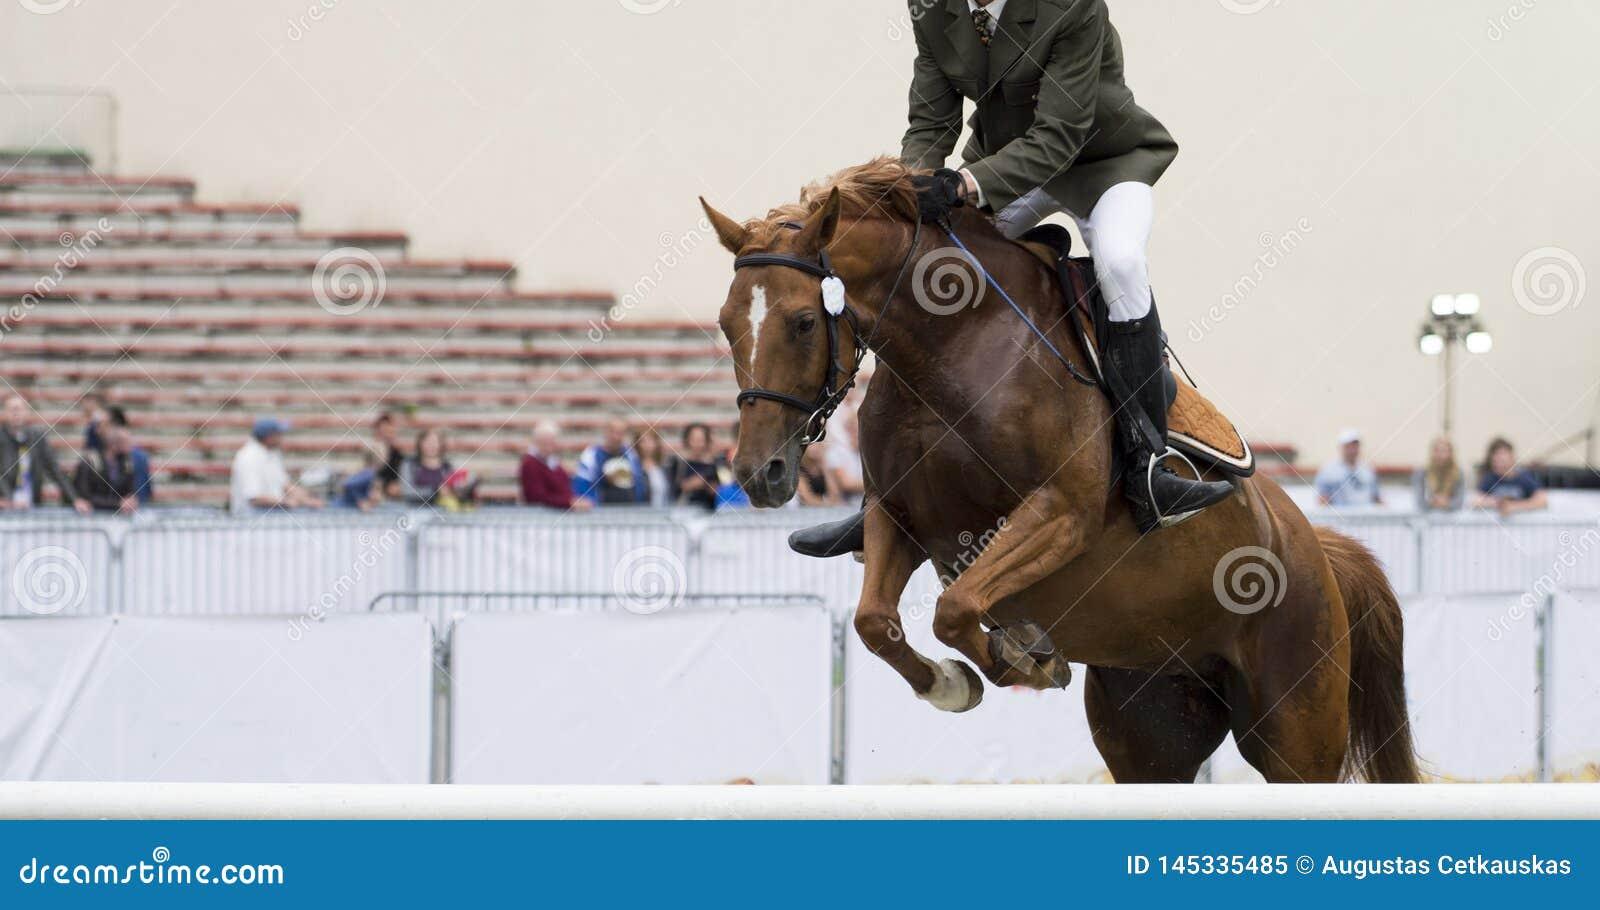 Esportes equestres, cavalo que salta, mostra que salta, equita??o